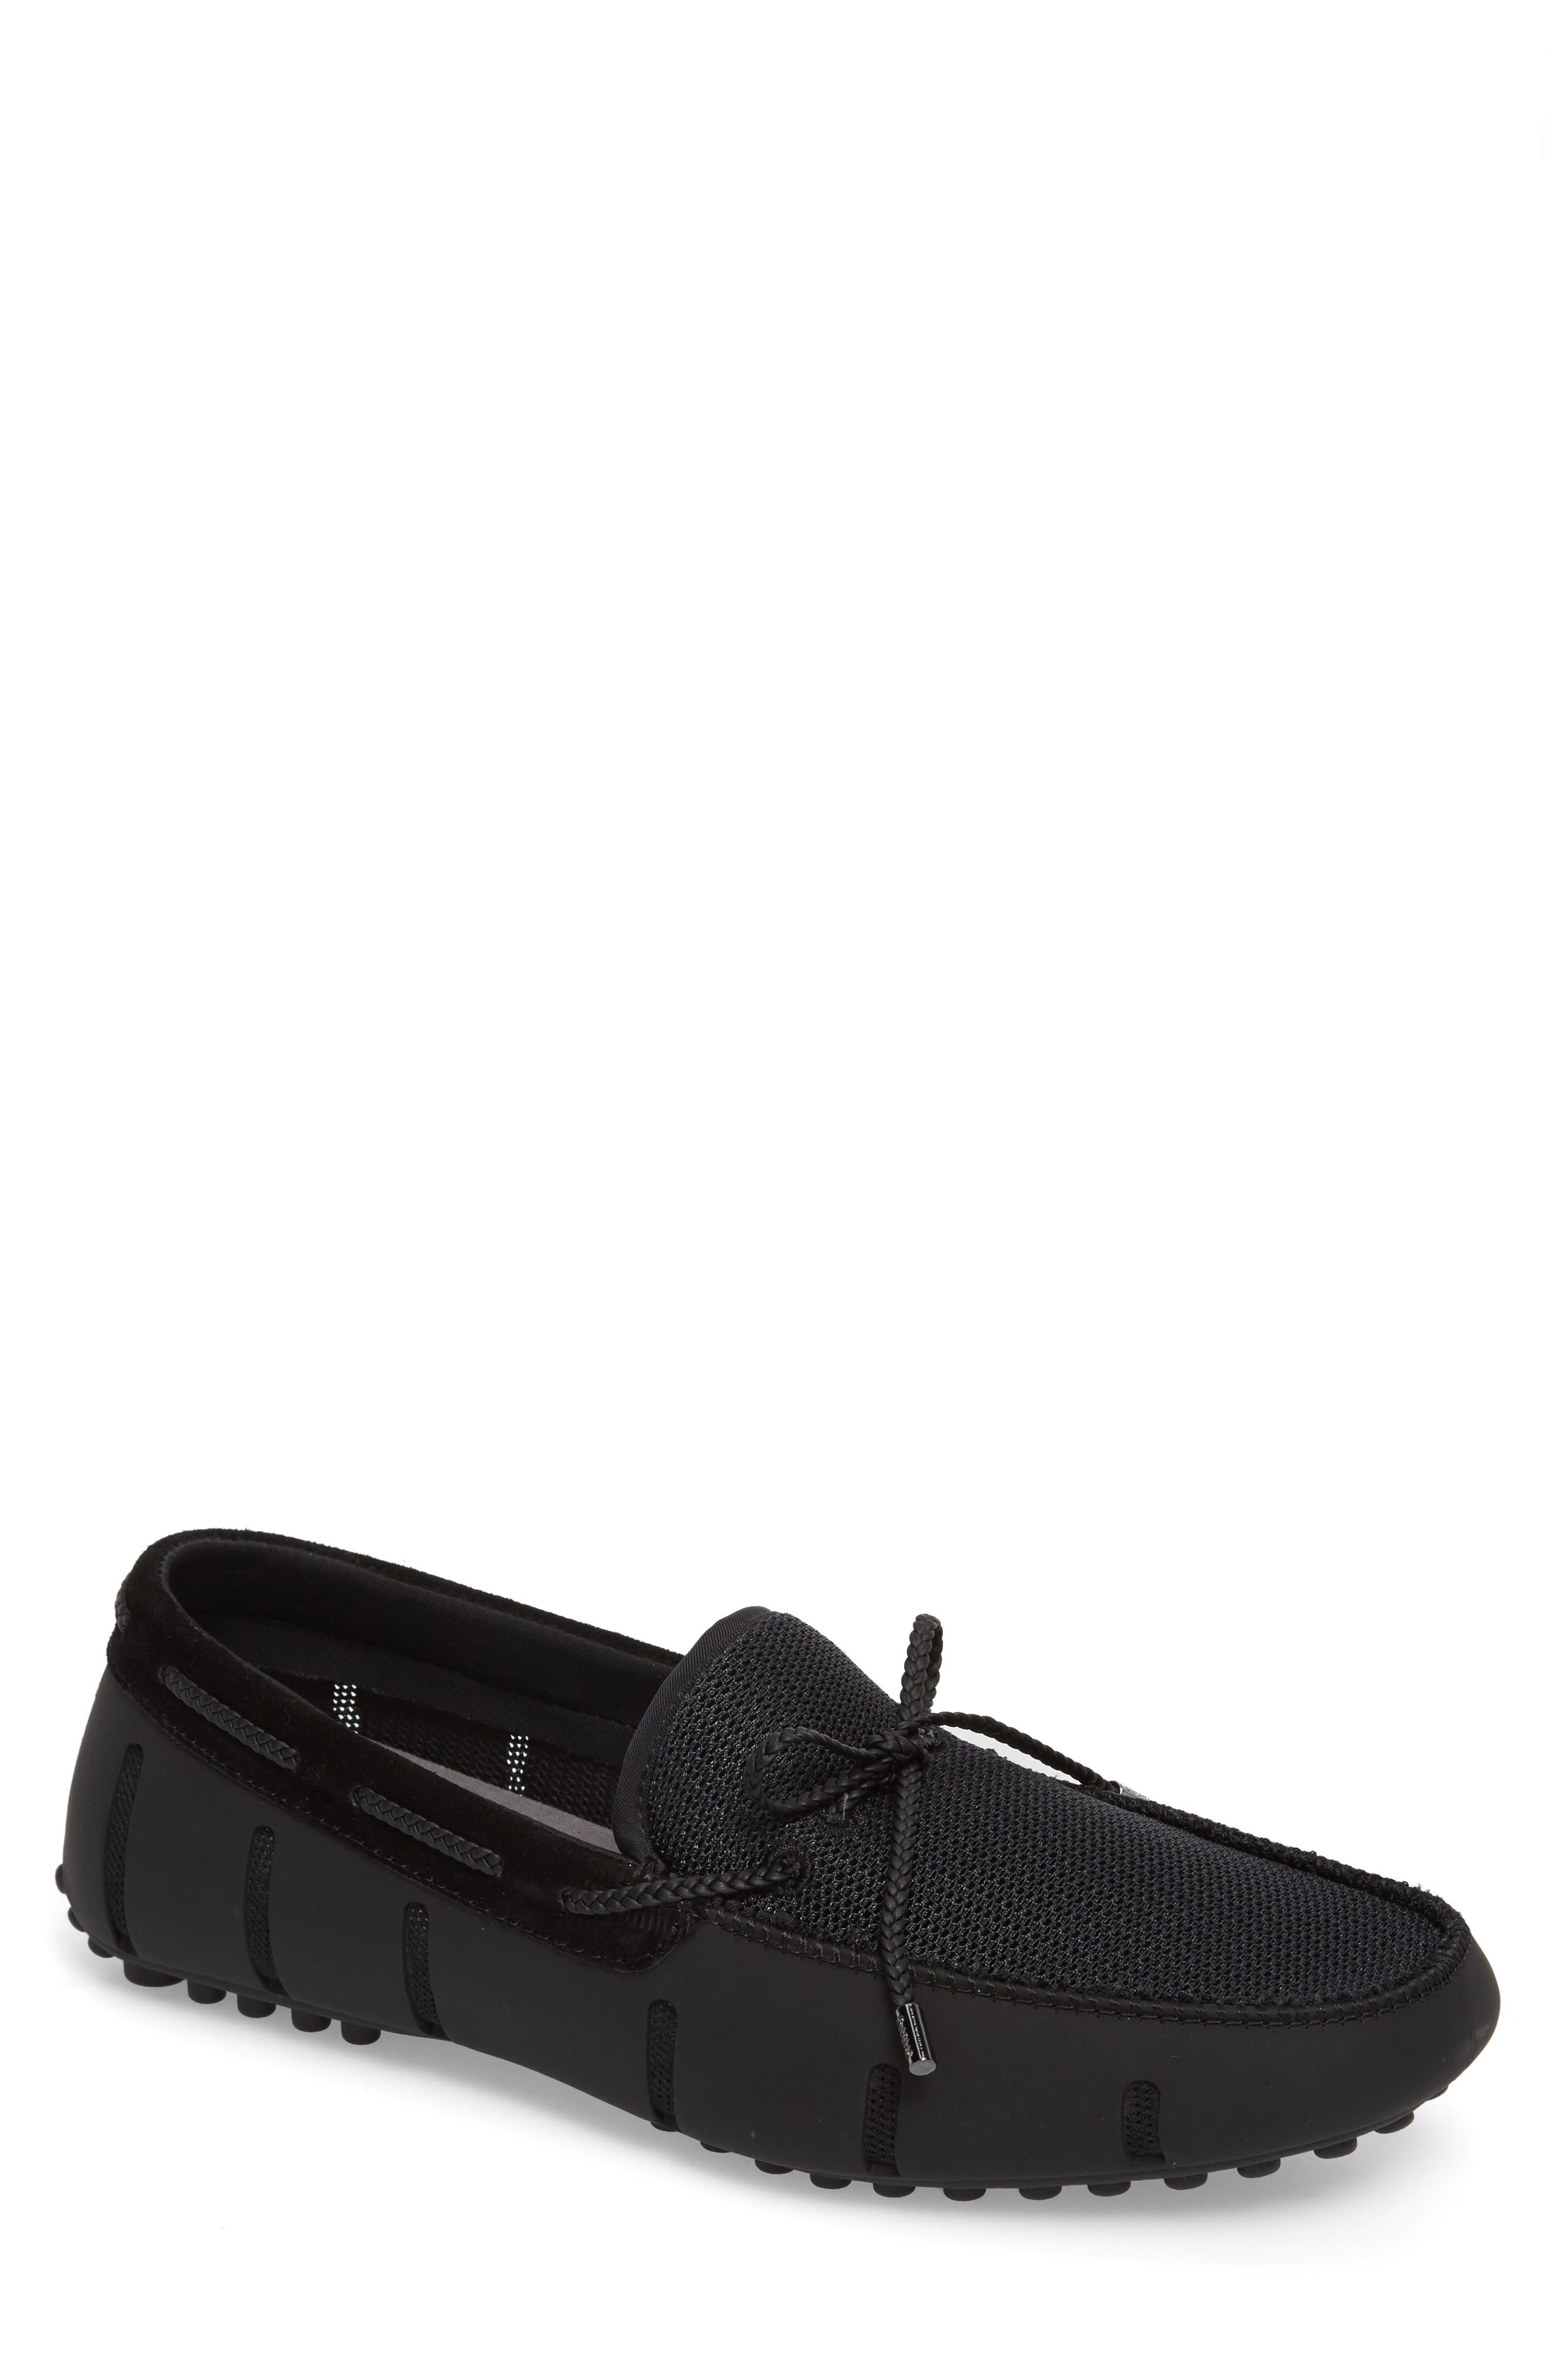 Driving Shoe,                         Main,                         color, Black/ Graphite